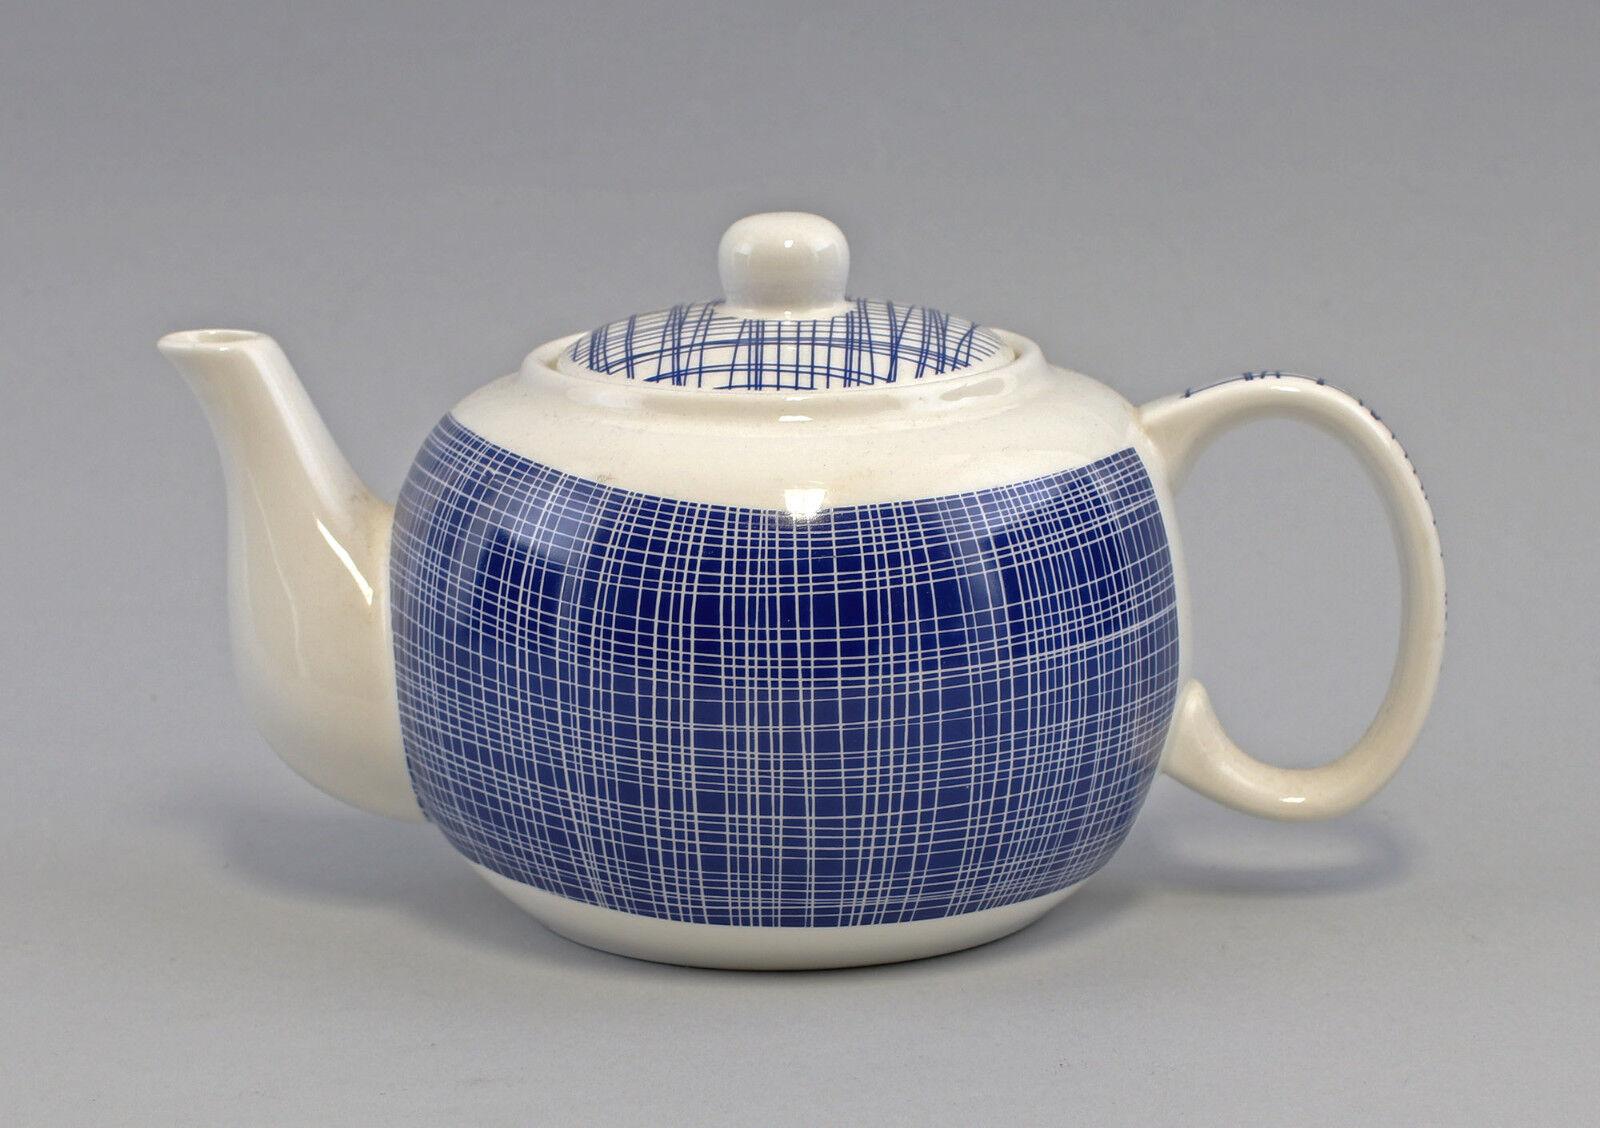 9952436 Tee-Kanne Brillantporzellan Nippon Linien blau 23x13cm 23x13cm 23x13cm 0,8L c754b3